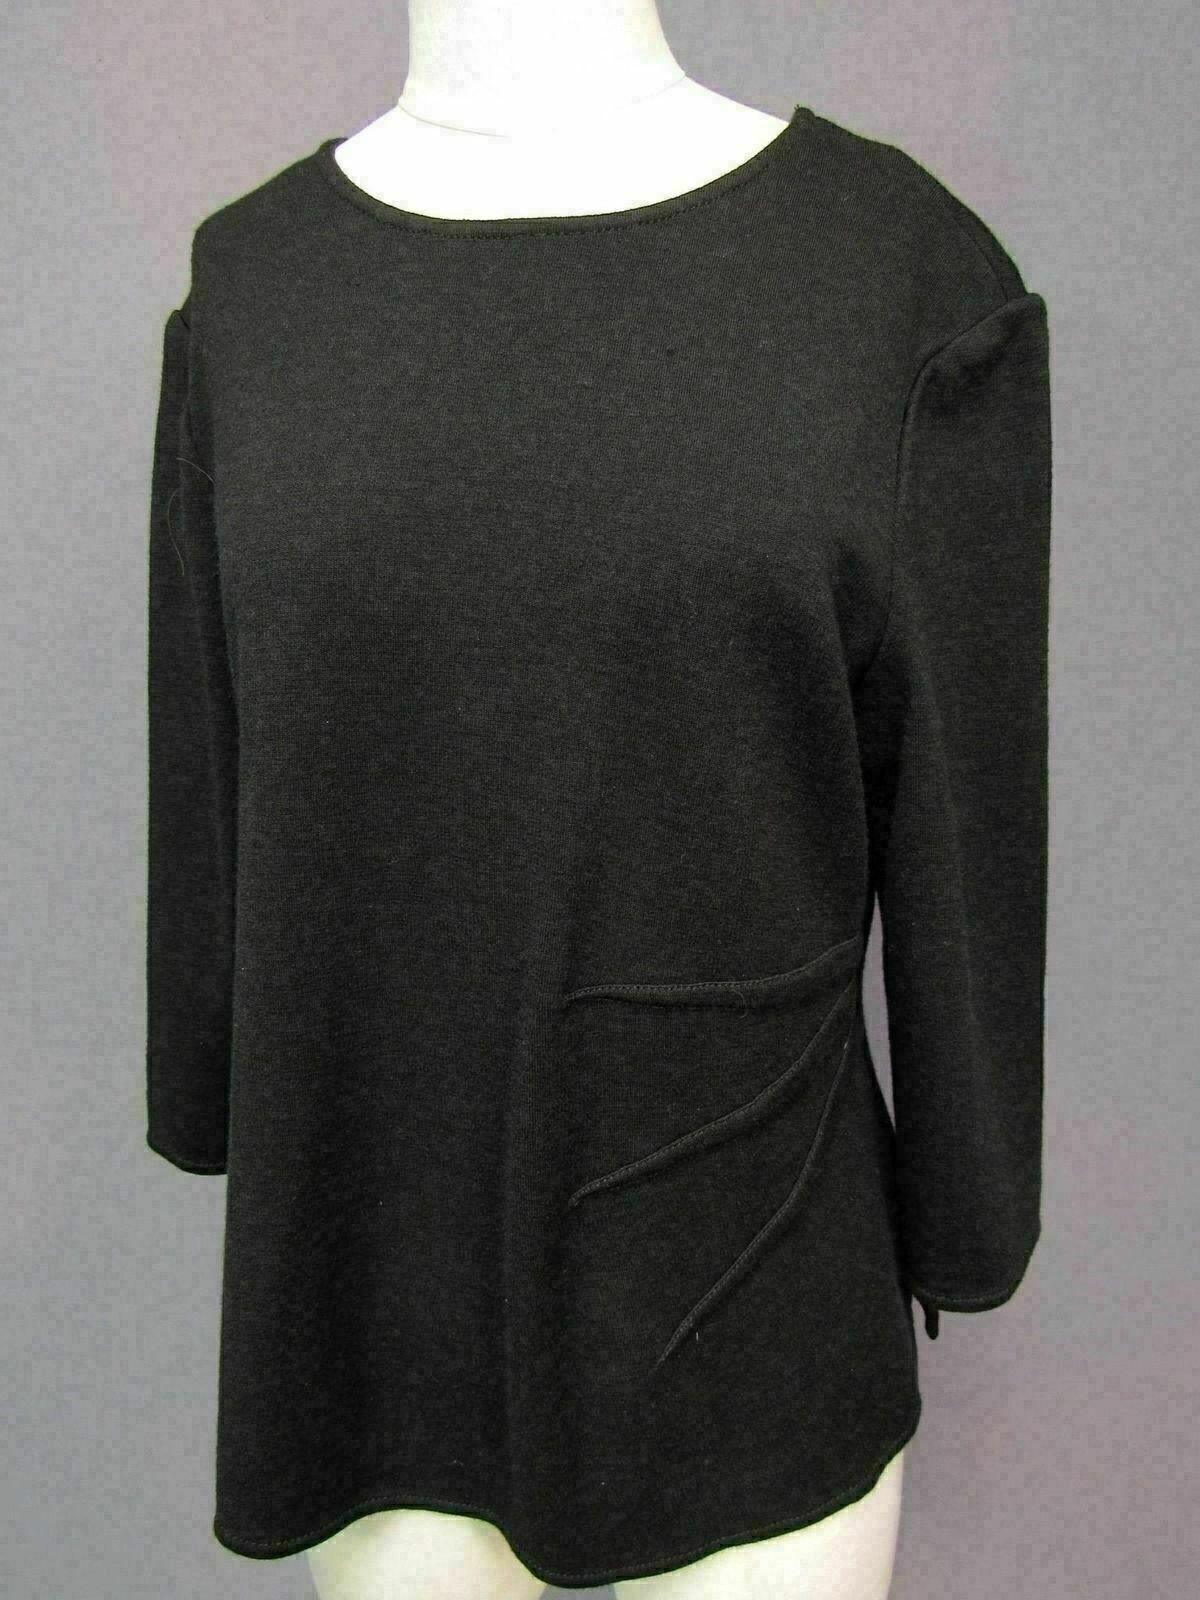 St John schwarz Zip Back 3 4 Sleeve Wool Blend Top Größe Large